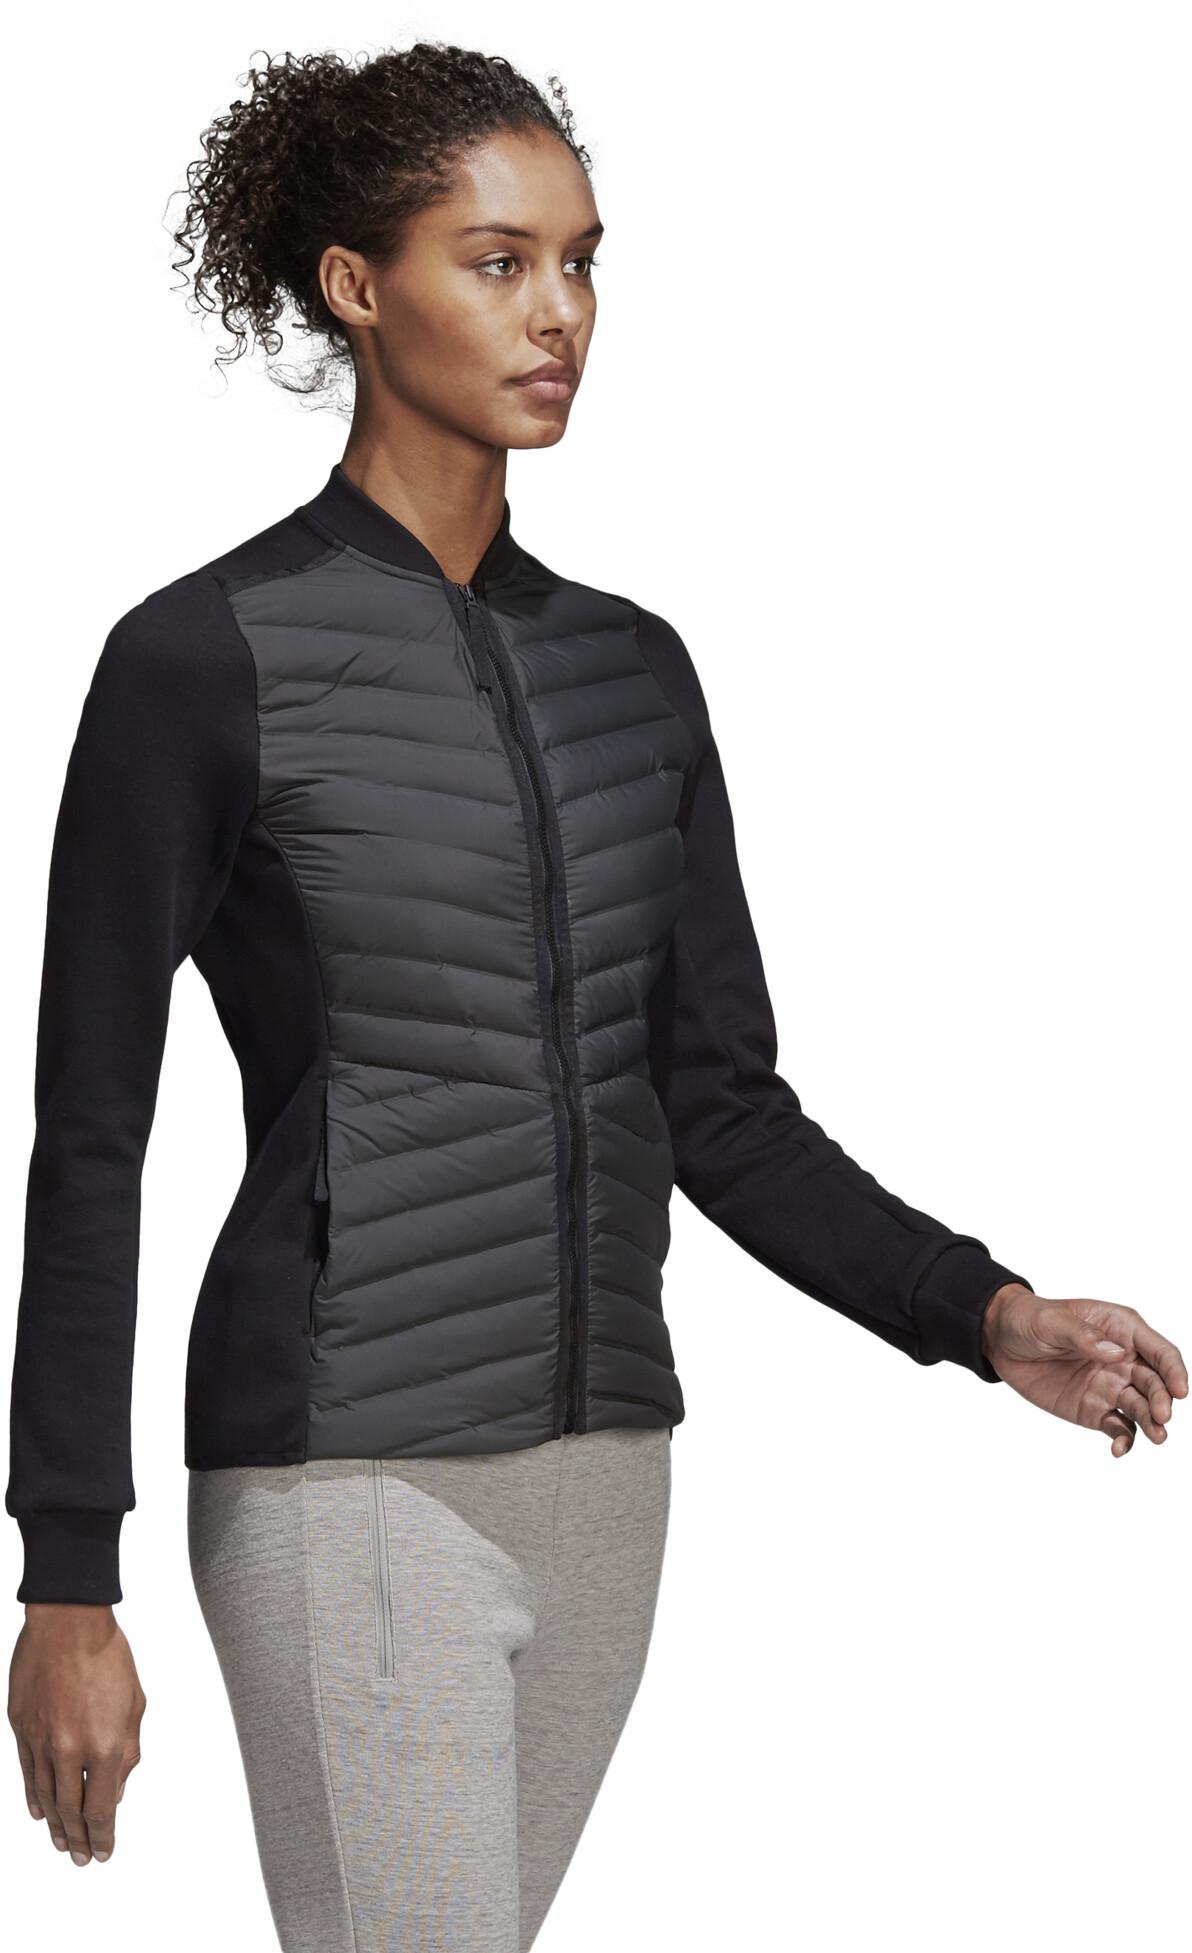 6e603905 adidas TERREX Varilite Hybrid Jakke Damer, black | Find outdoortøj ...